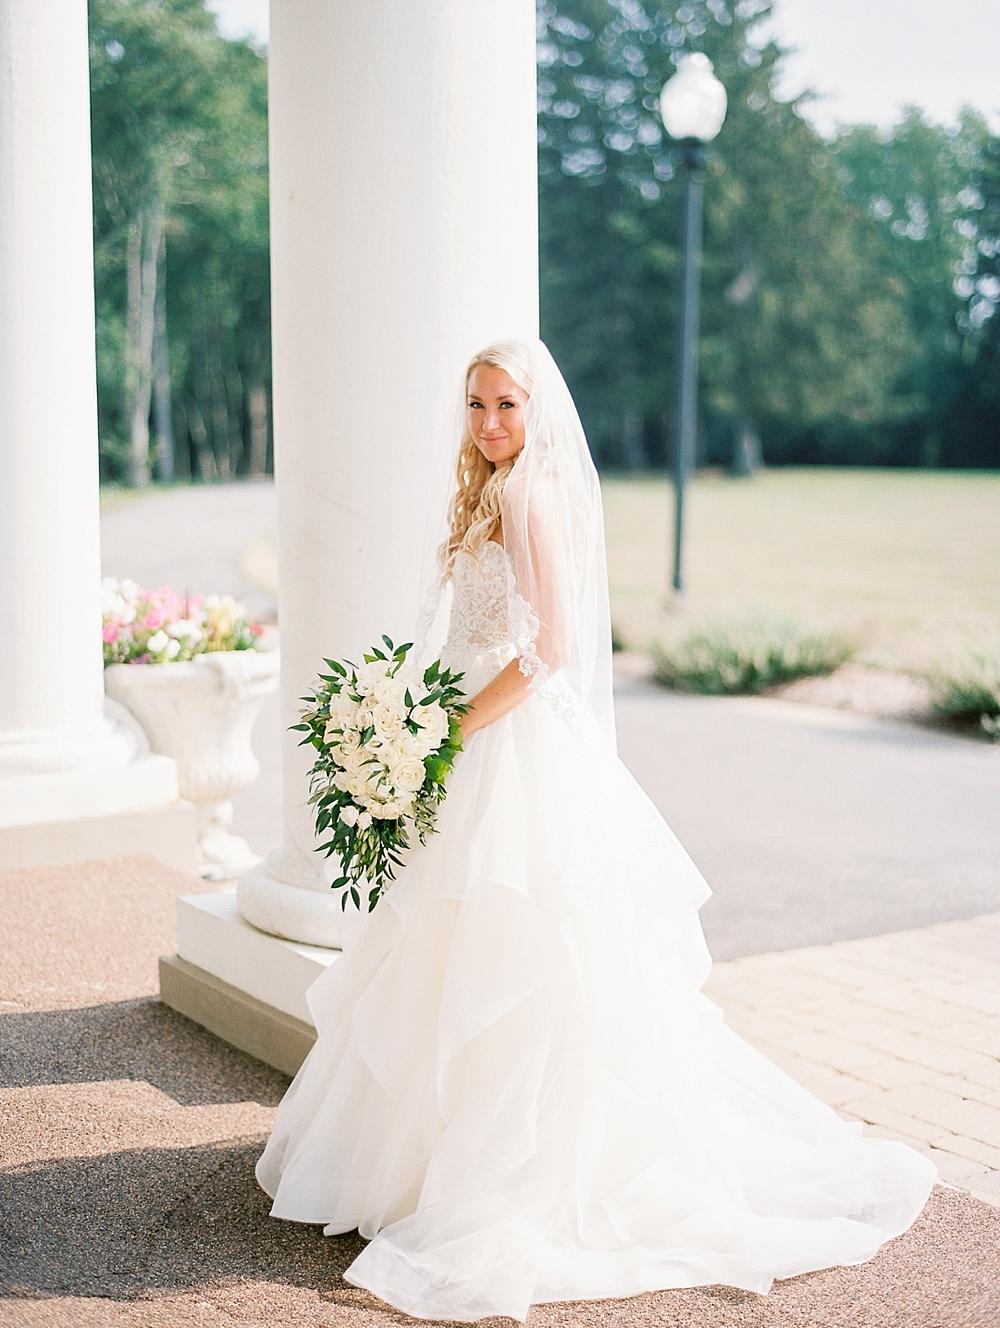 kristin-la-voie-photography-lehmann-mansion-wedding-photographer-202